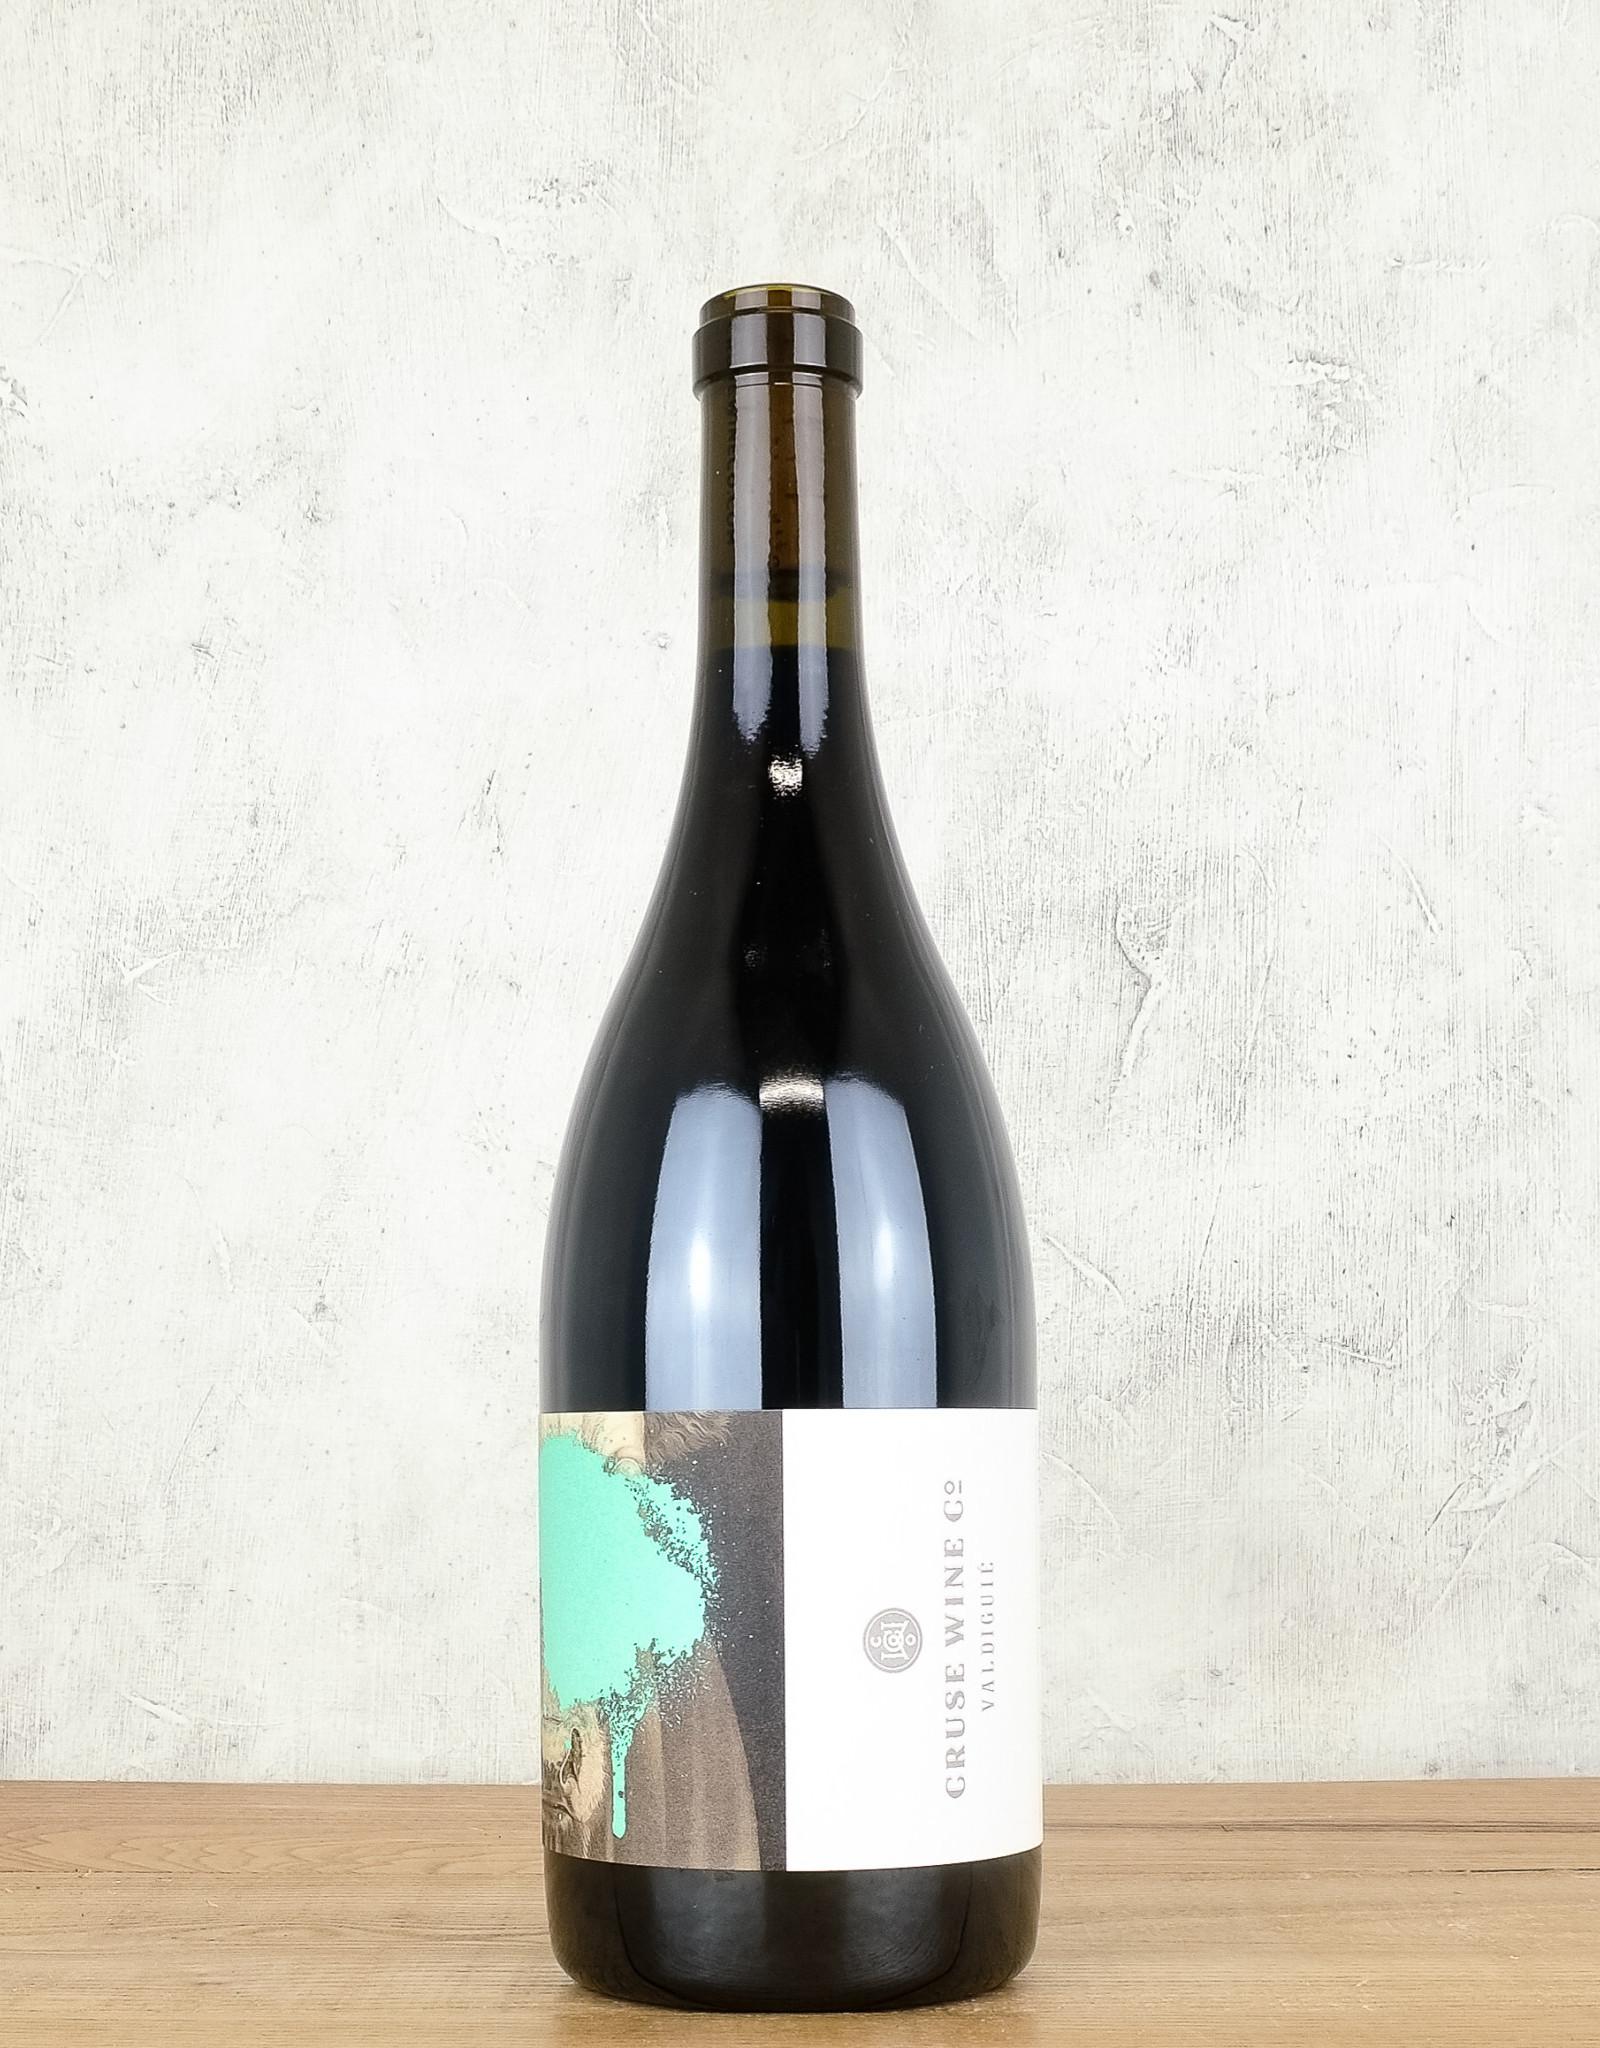 Cruse Wine Co Valdiguie